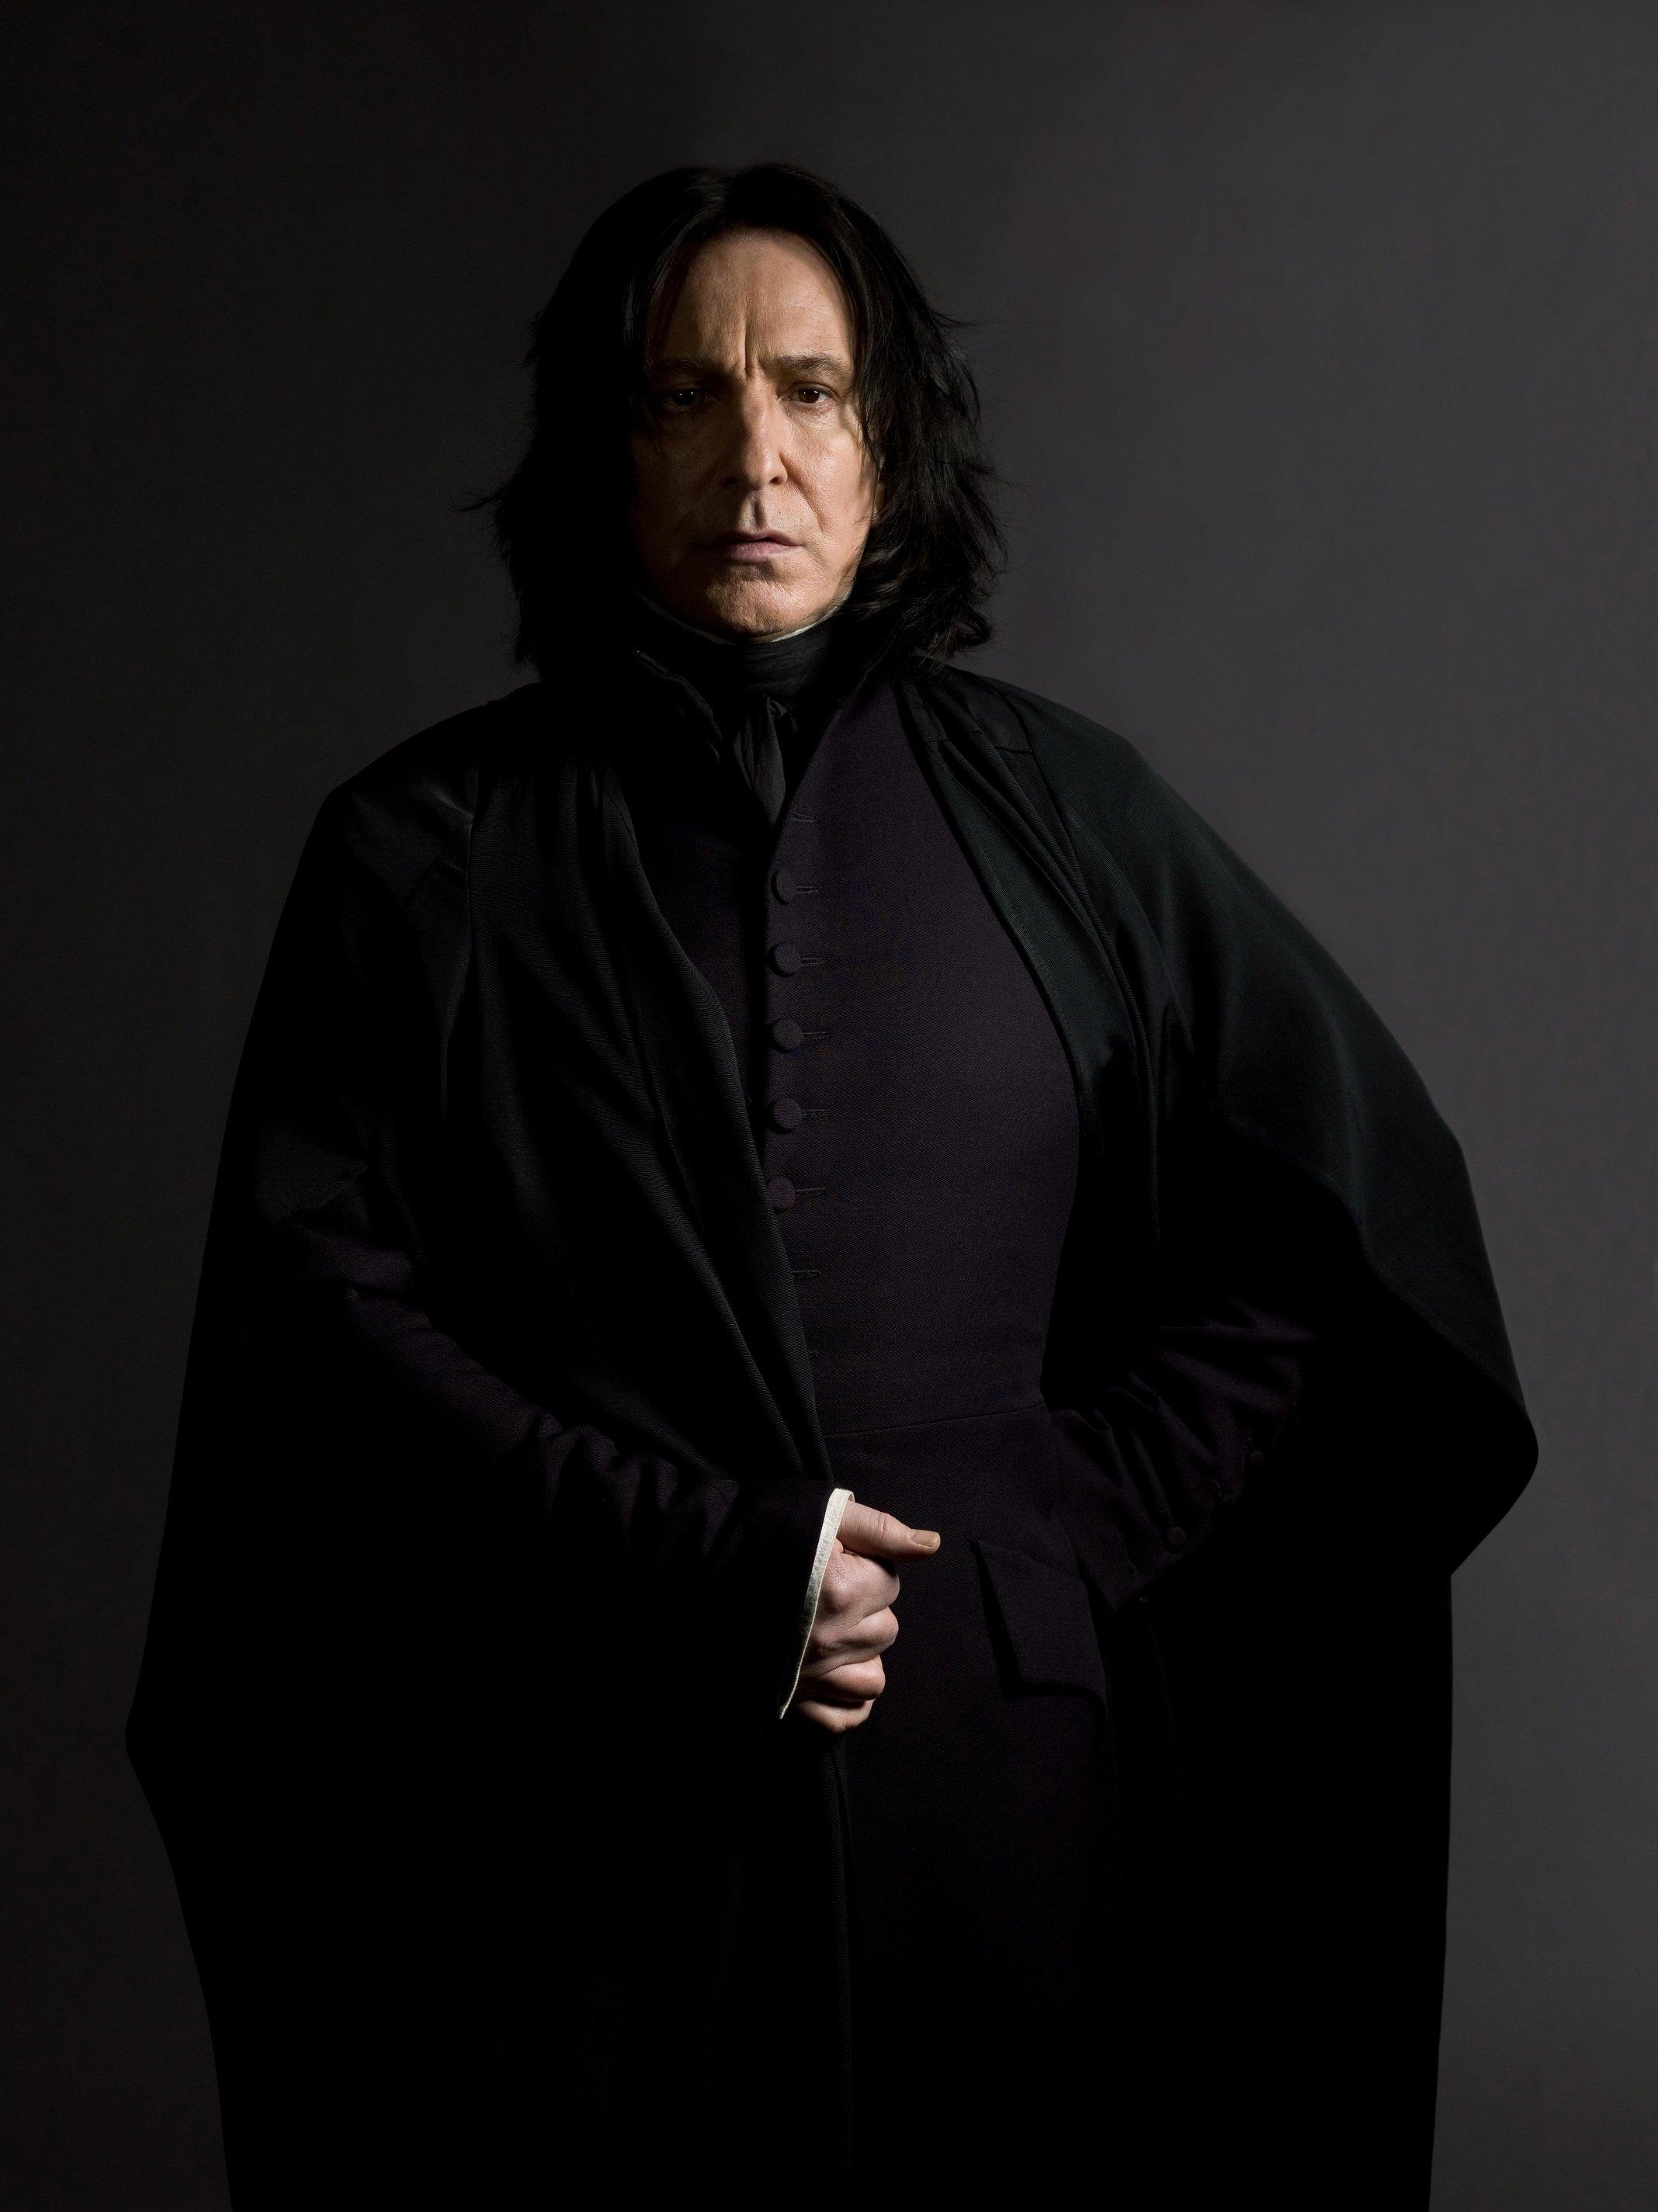 Severus Snape Son Of Durmstrang Harry Potter Fanon Wiki Fandom Where we encourage violence, and the dark arts. severus snape son of durmstrang